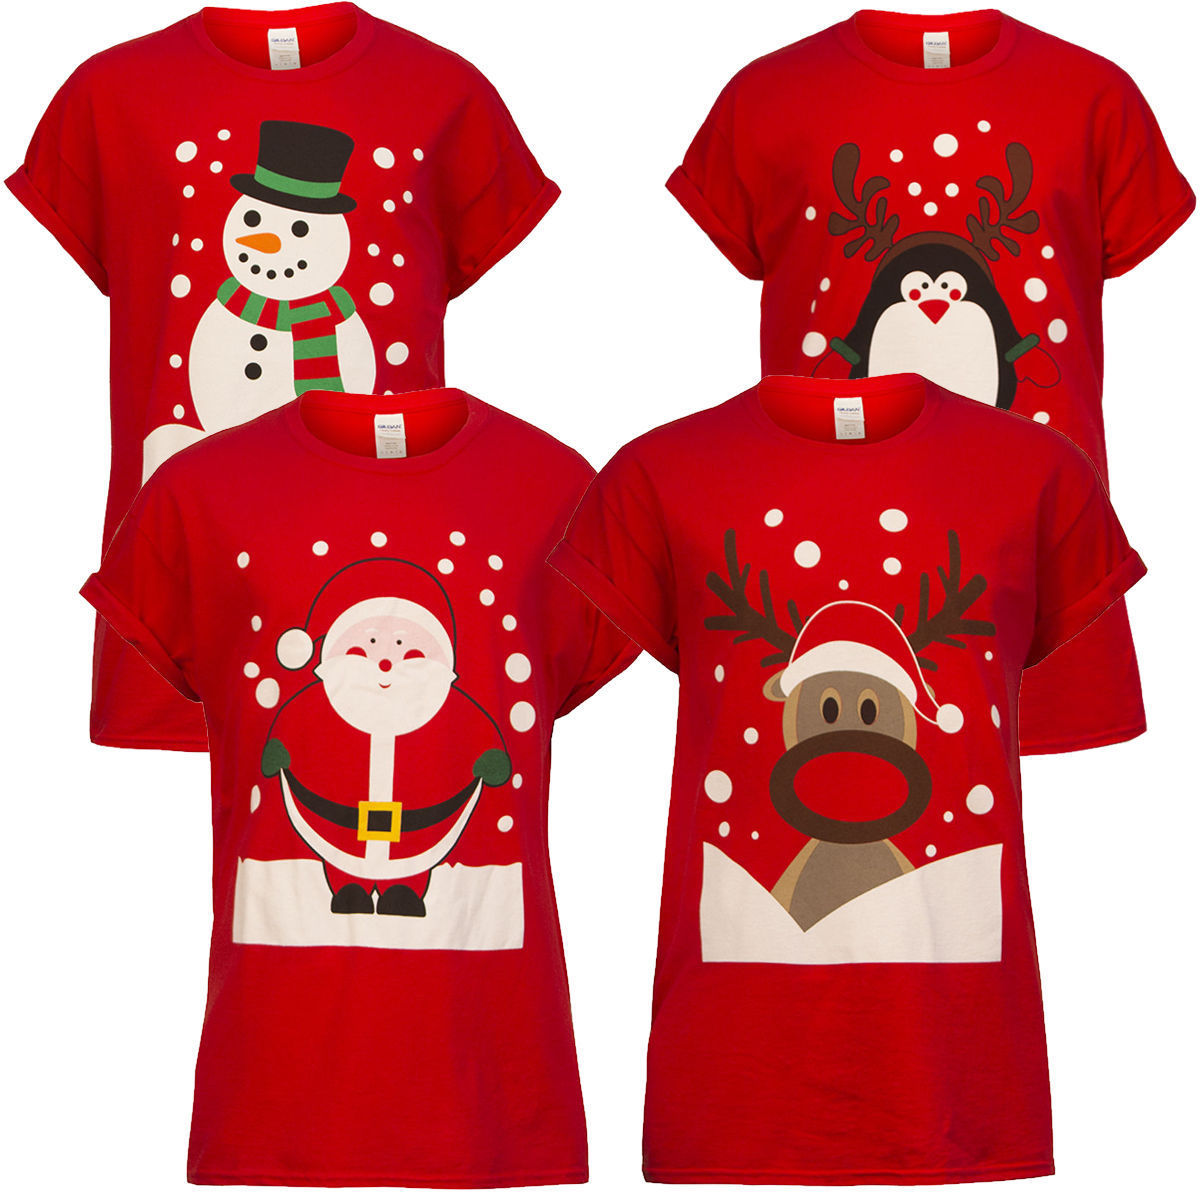 HIRIGIN 2018 Fashion Hot Men Women Adults Unisex Novelty Christmas Xmas T-shirt Top Casual Tee Festive Gift